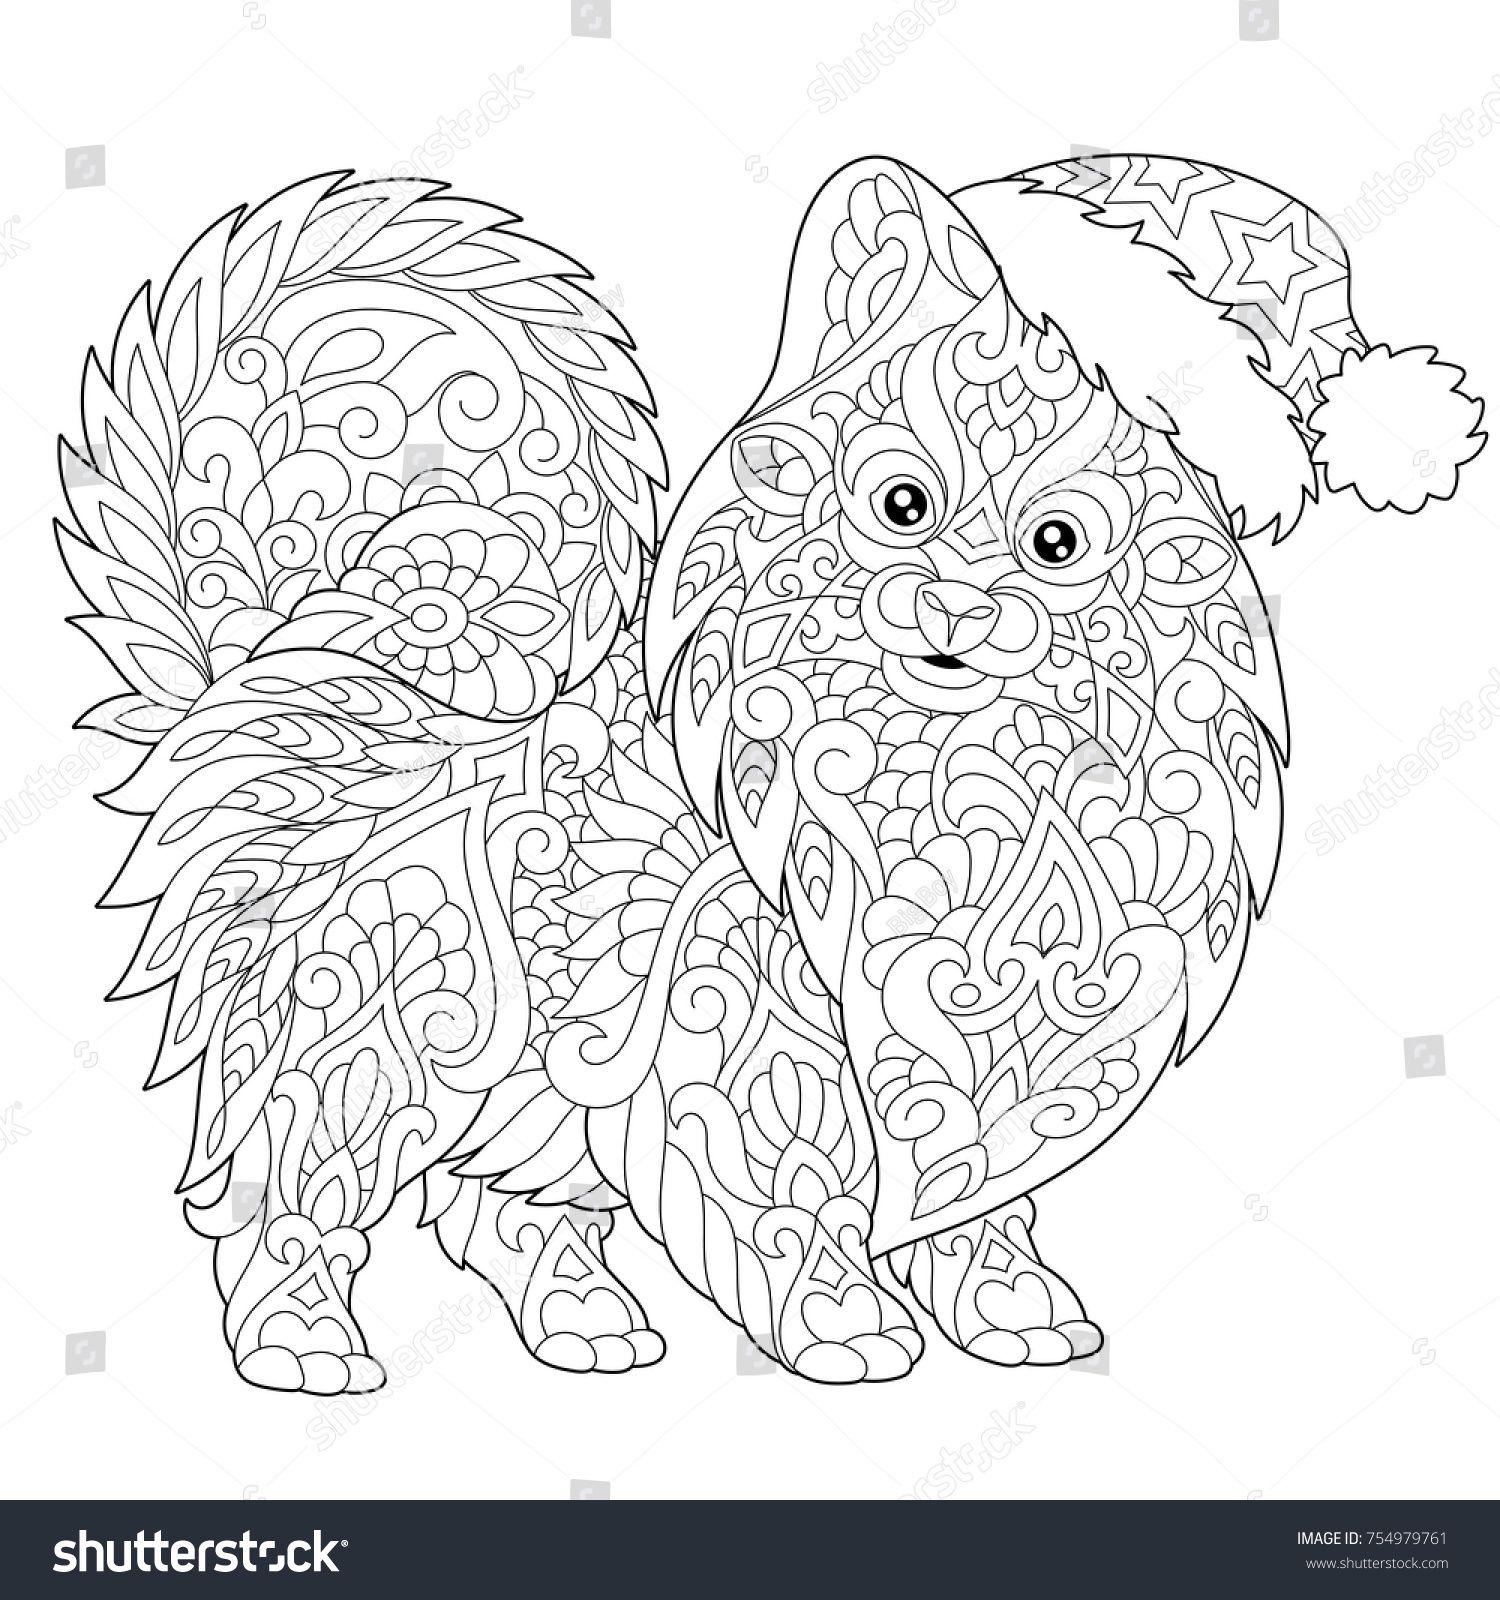 Pomeranian Coloring Page Nacho Dog Coloring Book Horse